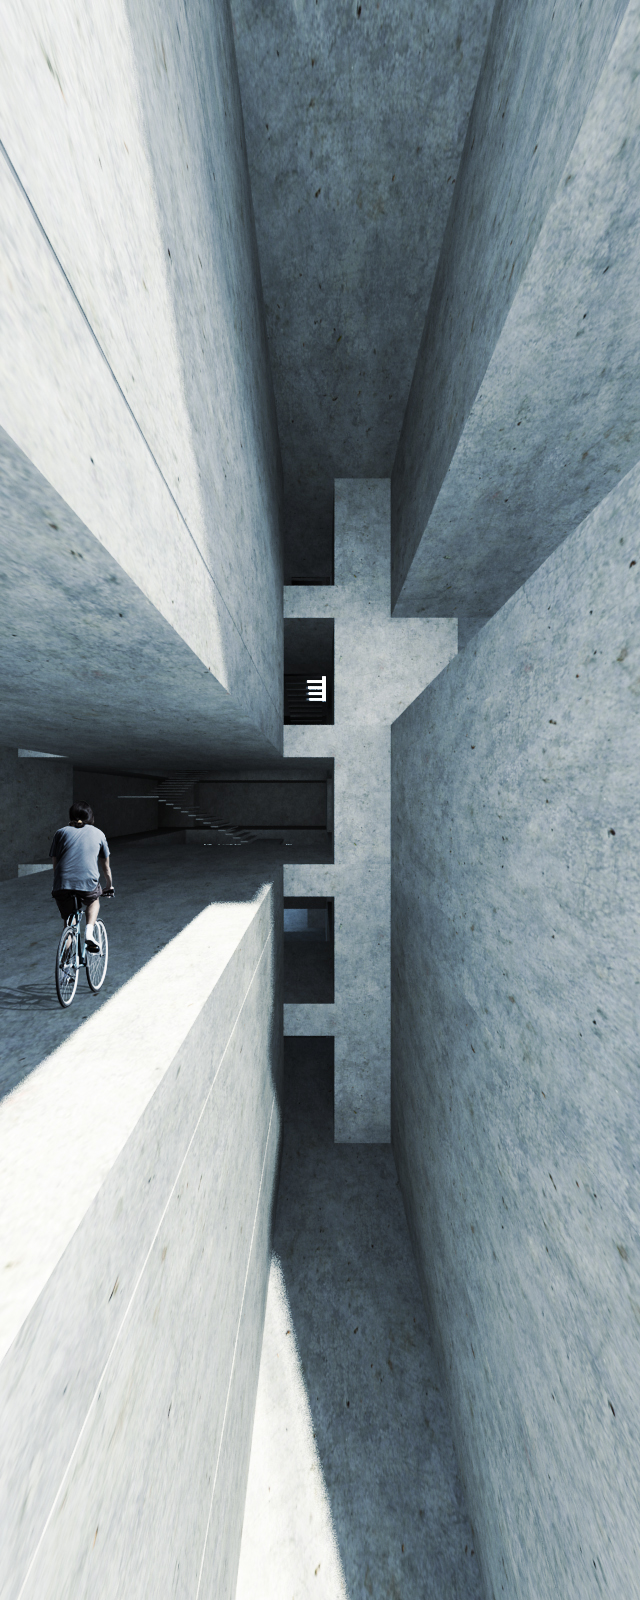 Interior_In Between_09_edited.jpg